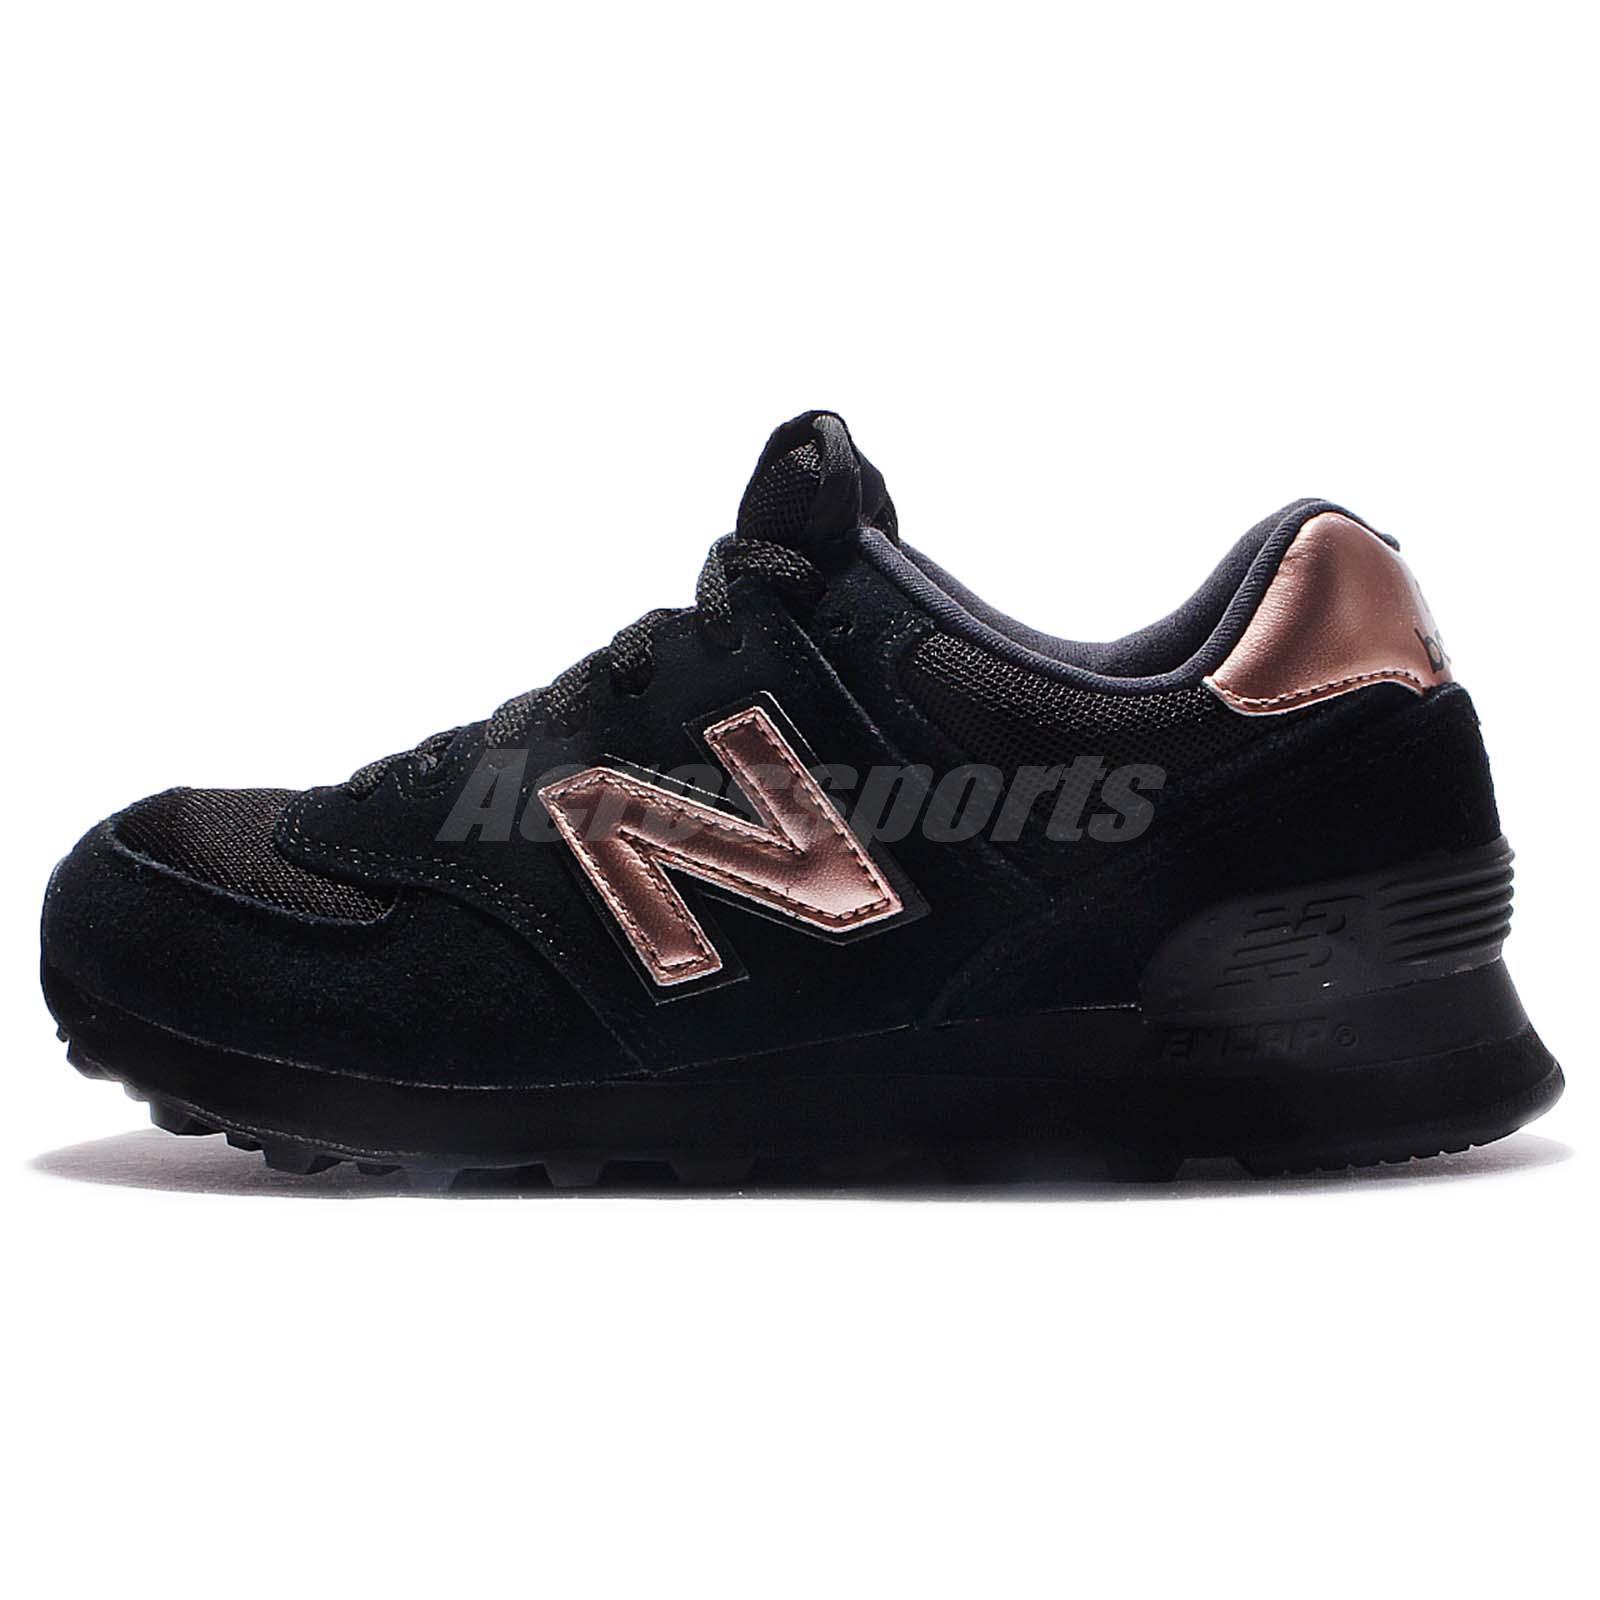 new balance wl574chd b molten metallic black gold women running shoes wl574chdb ebay. Black Bedroom Furniture Sets. Home Design Ideas